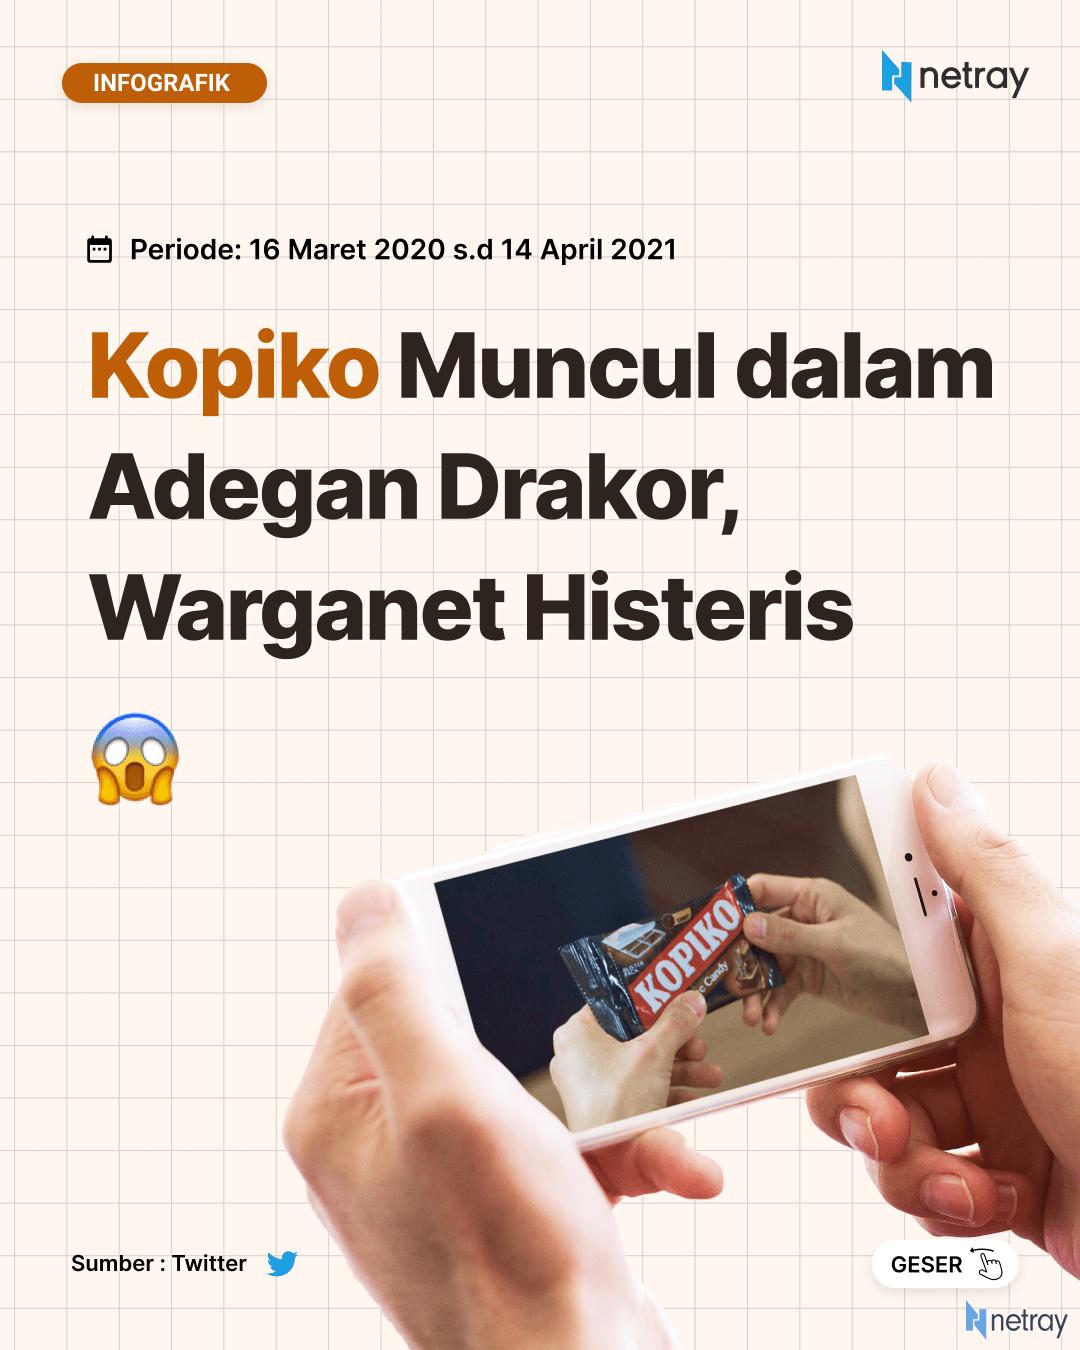 Kopiko Muncul Dalam Adegan Drakor, Warganet Histeris